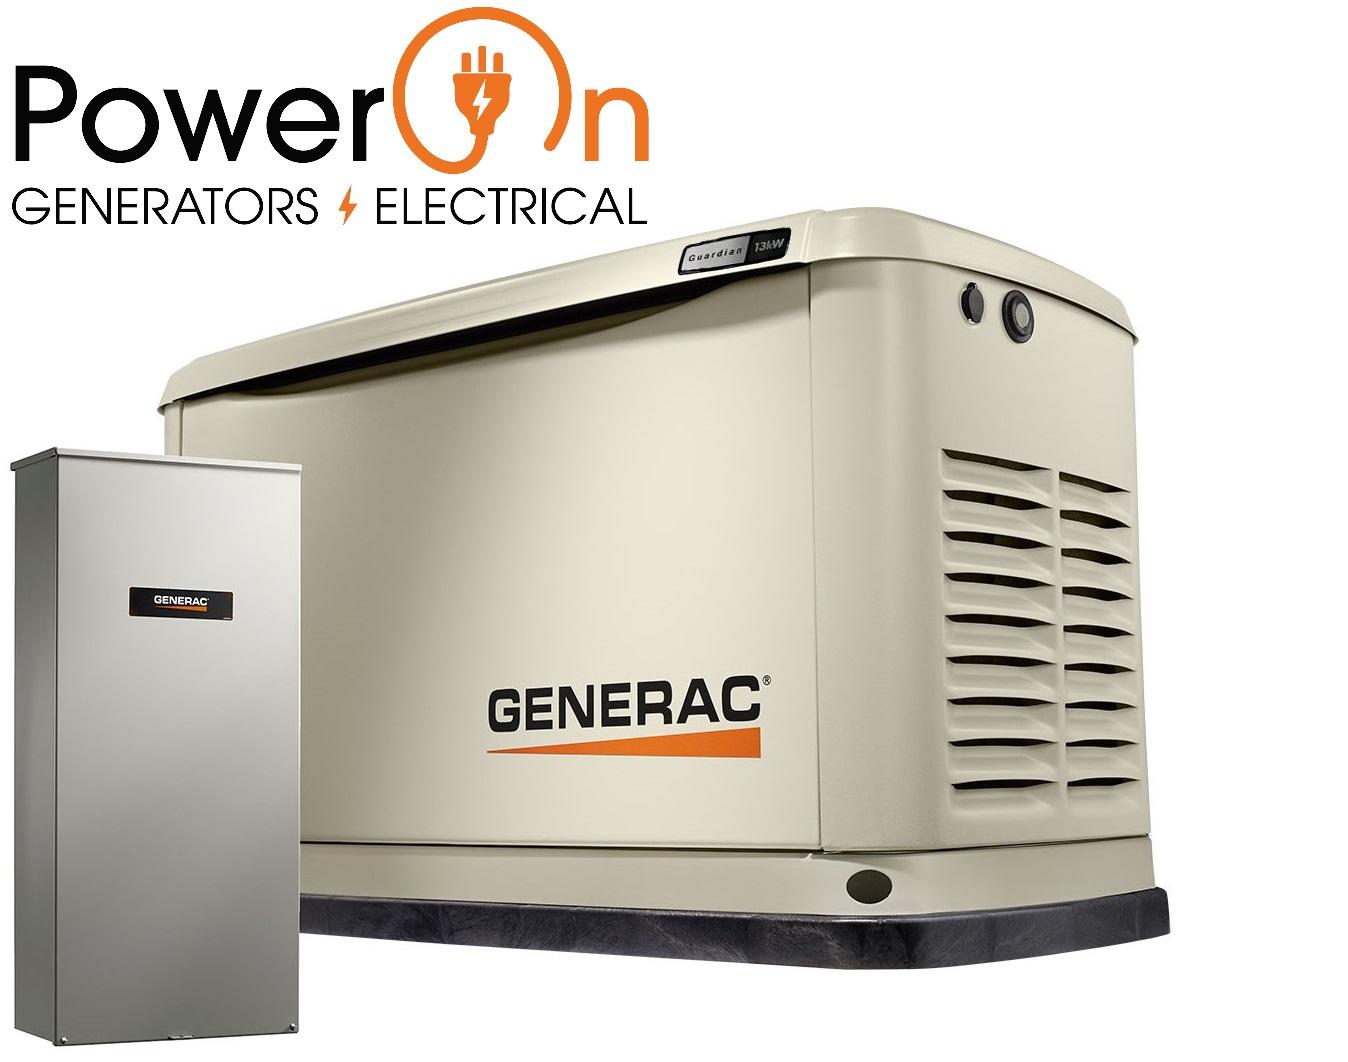 Cleveland Generator Companies - Generac Dealers